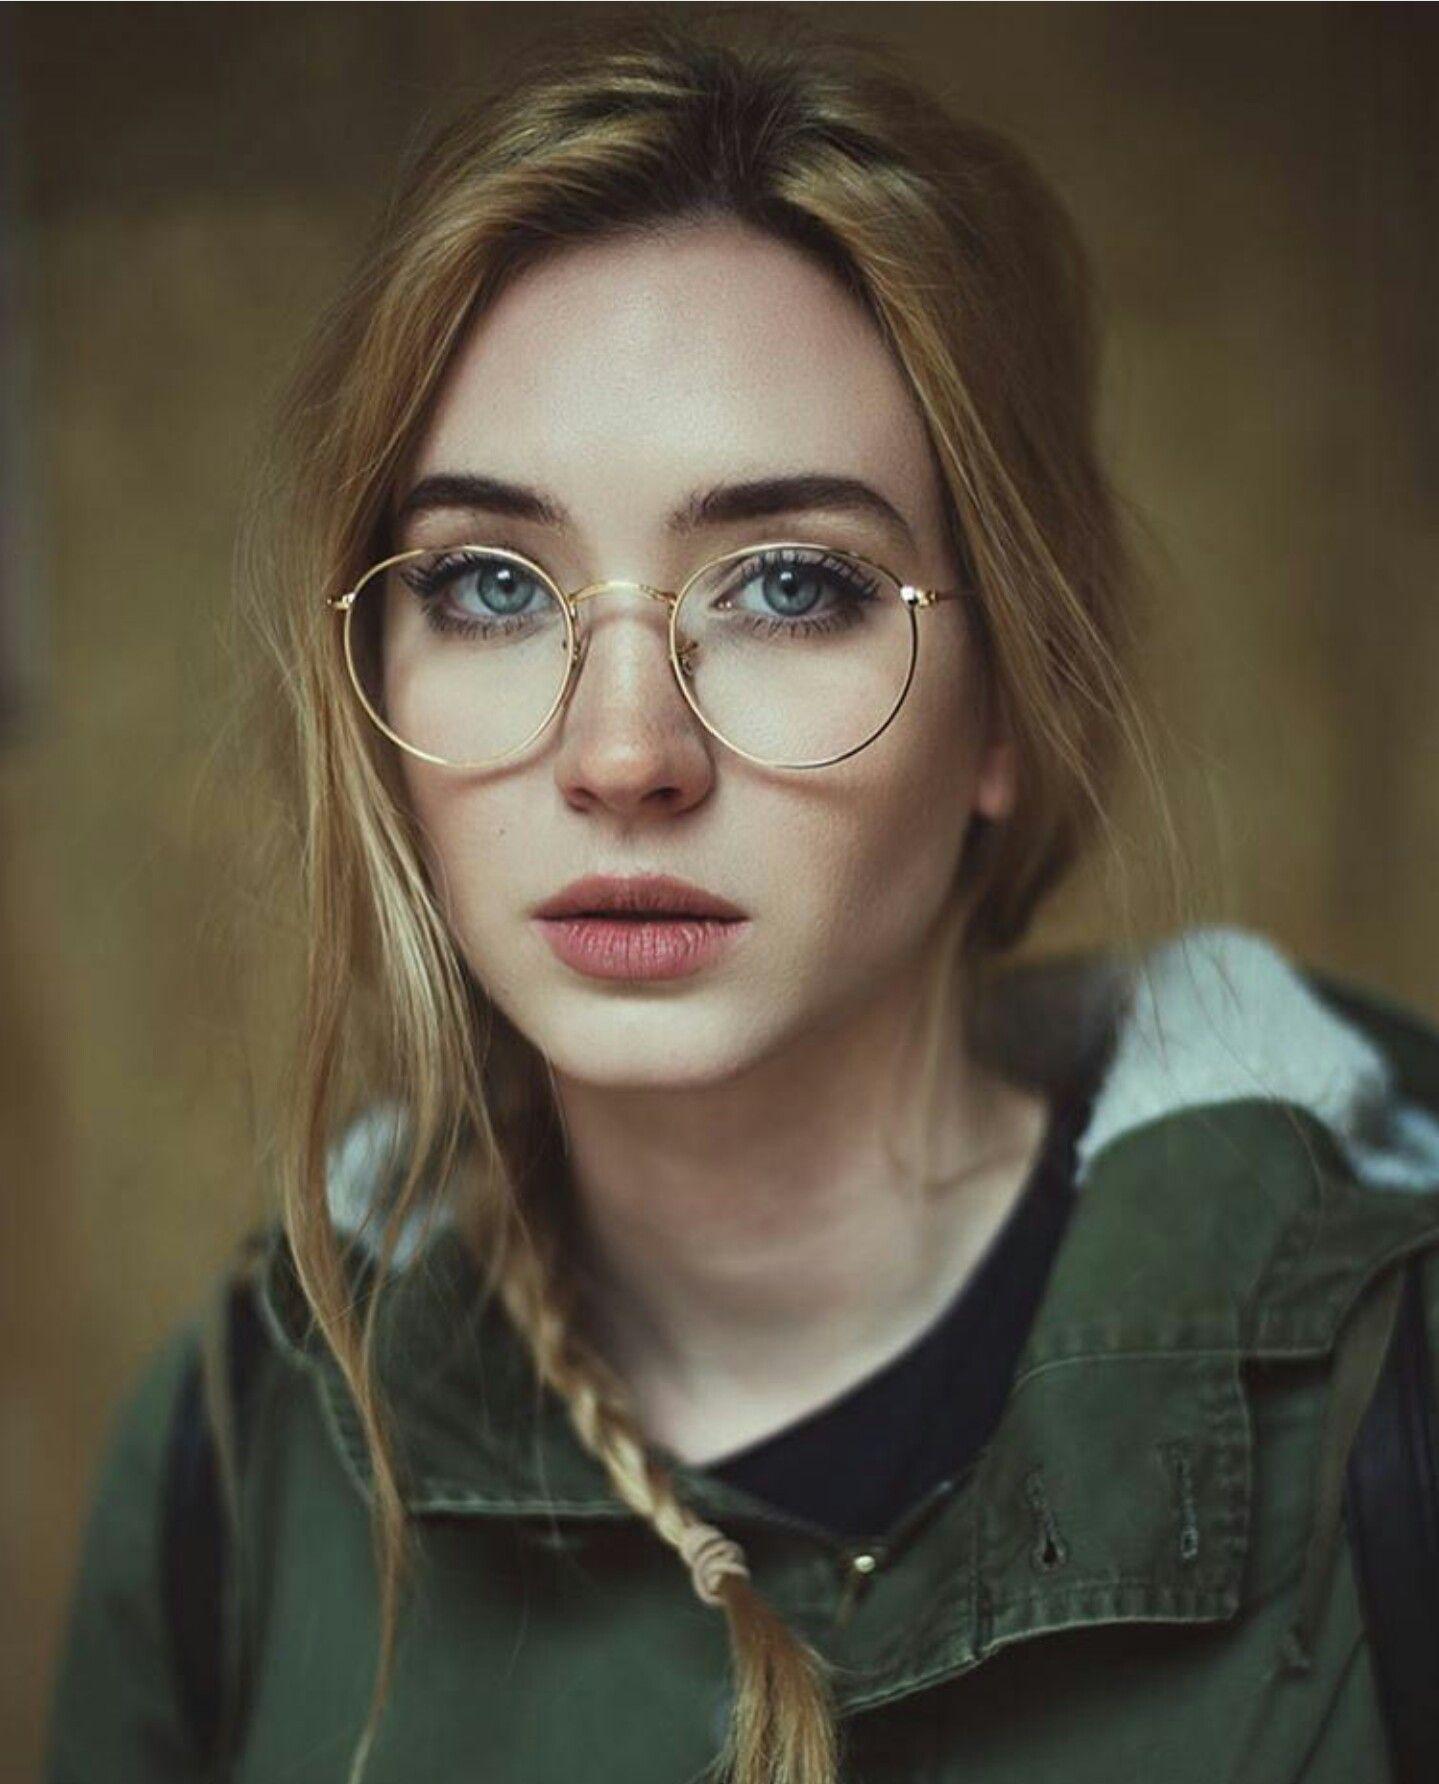 Red Skinny Oval Sunglasses | Glasses fashion, Oval